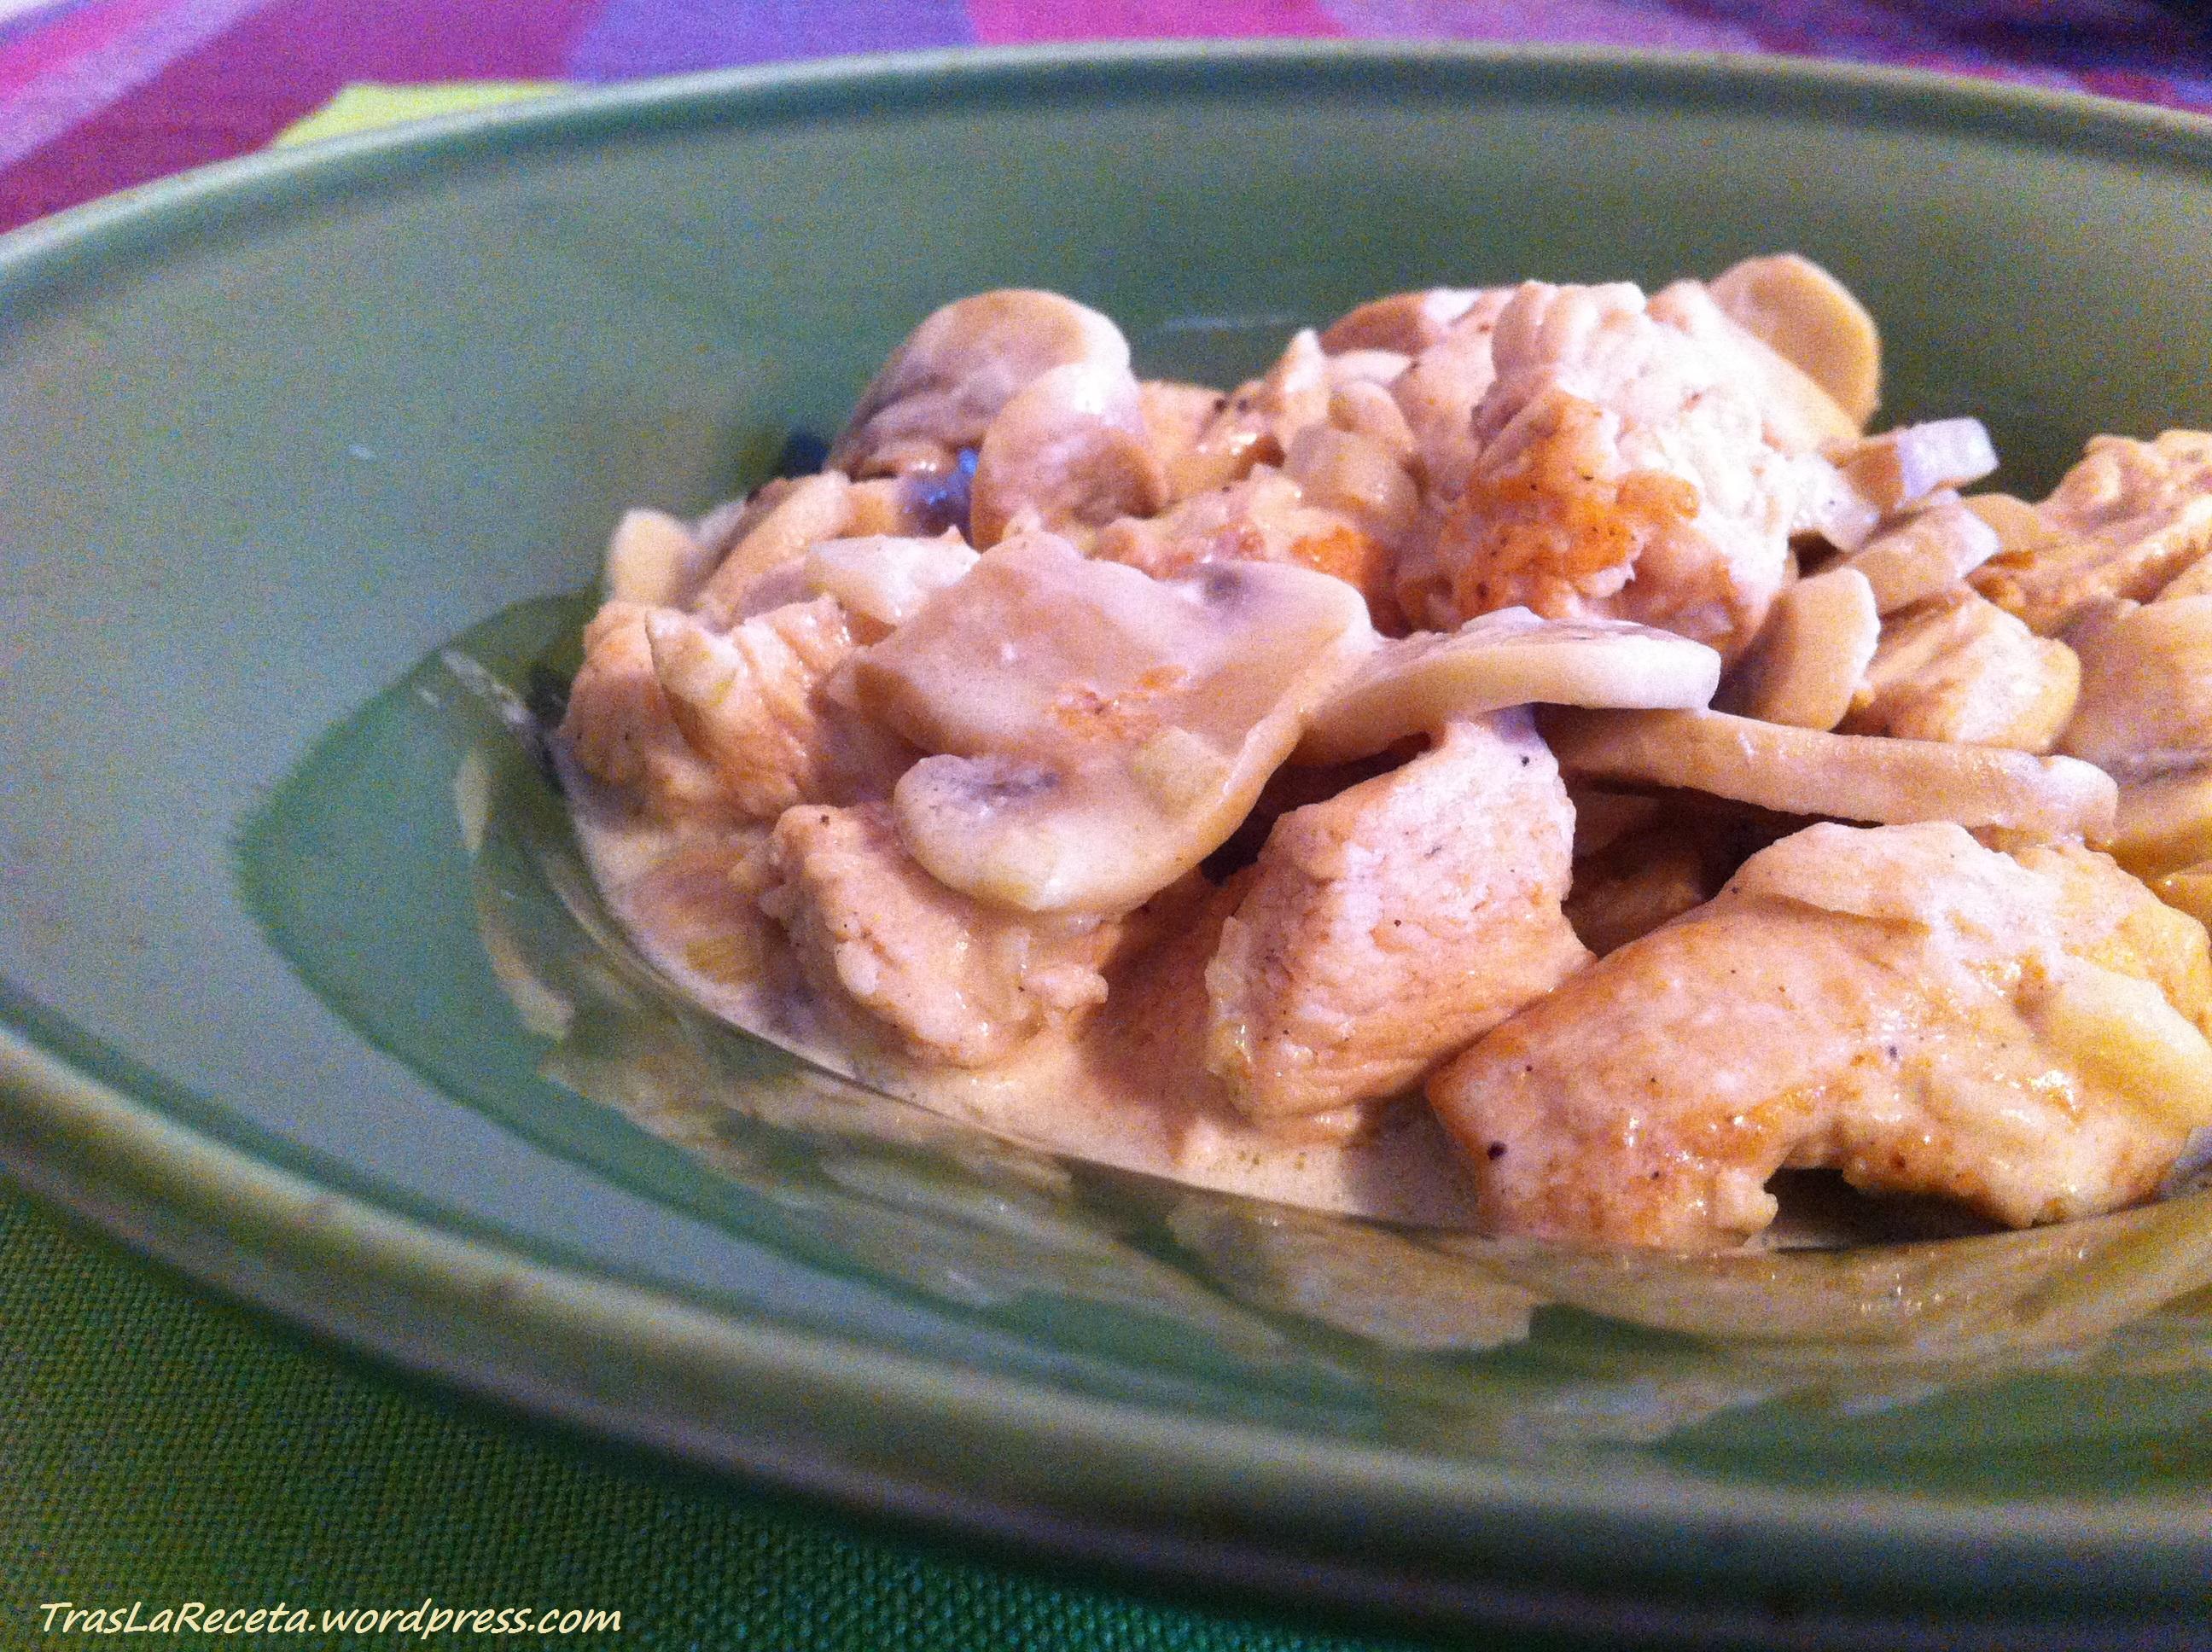 Stroganov de pollo o Pollo en salsa de nata | tras la receta